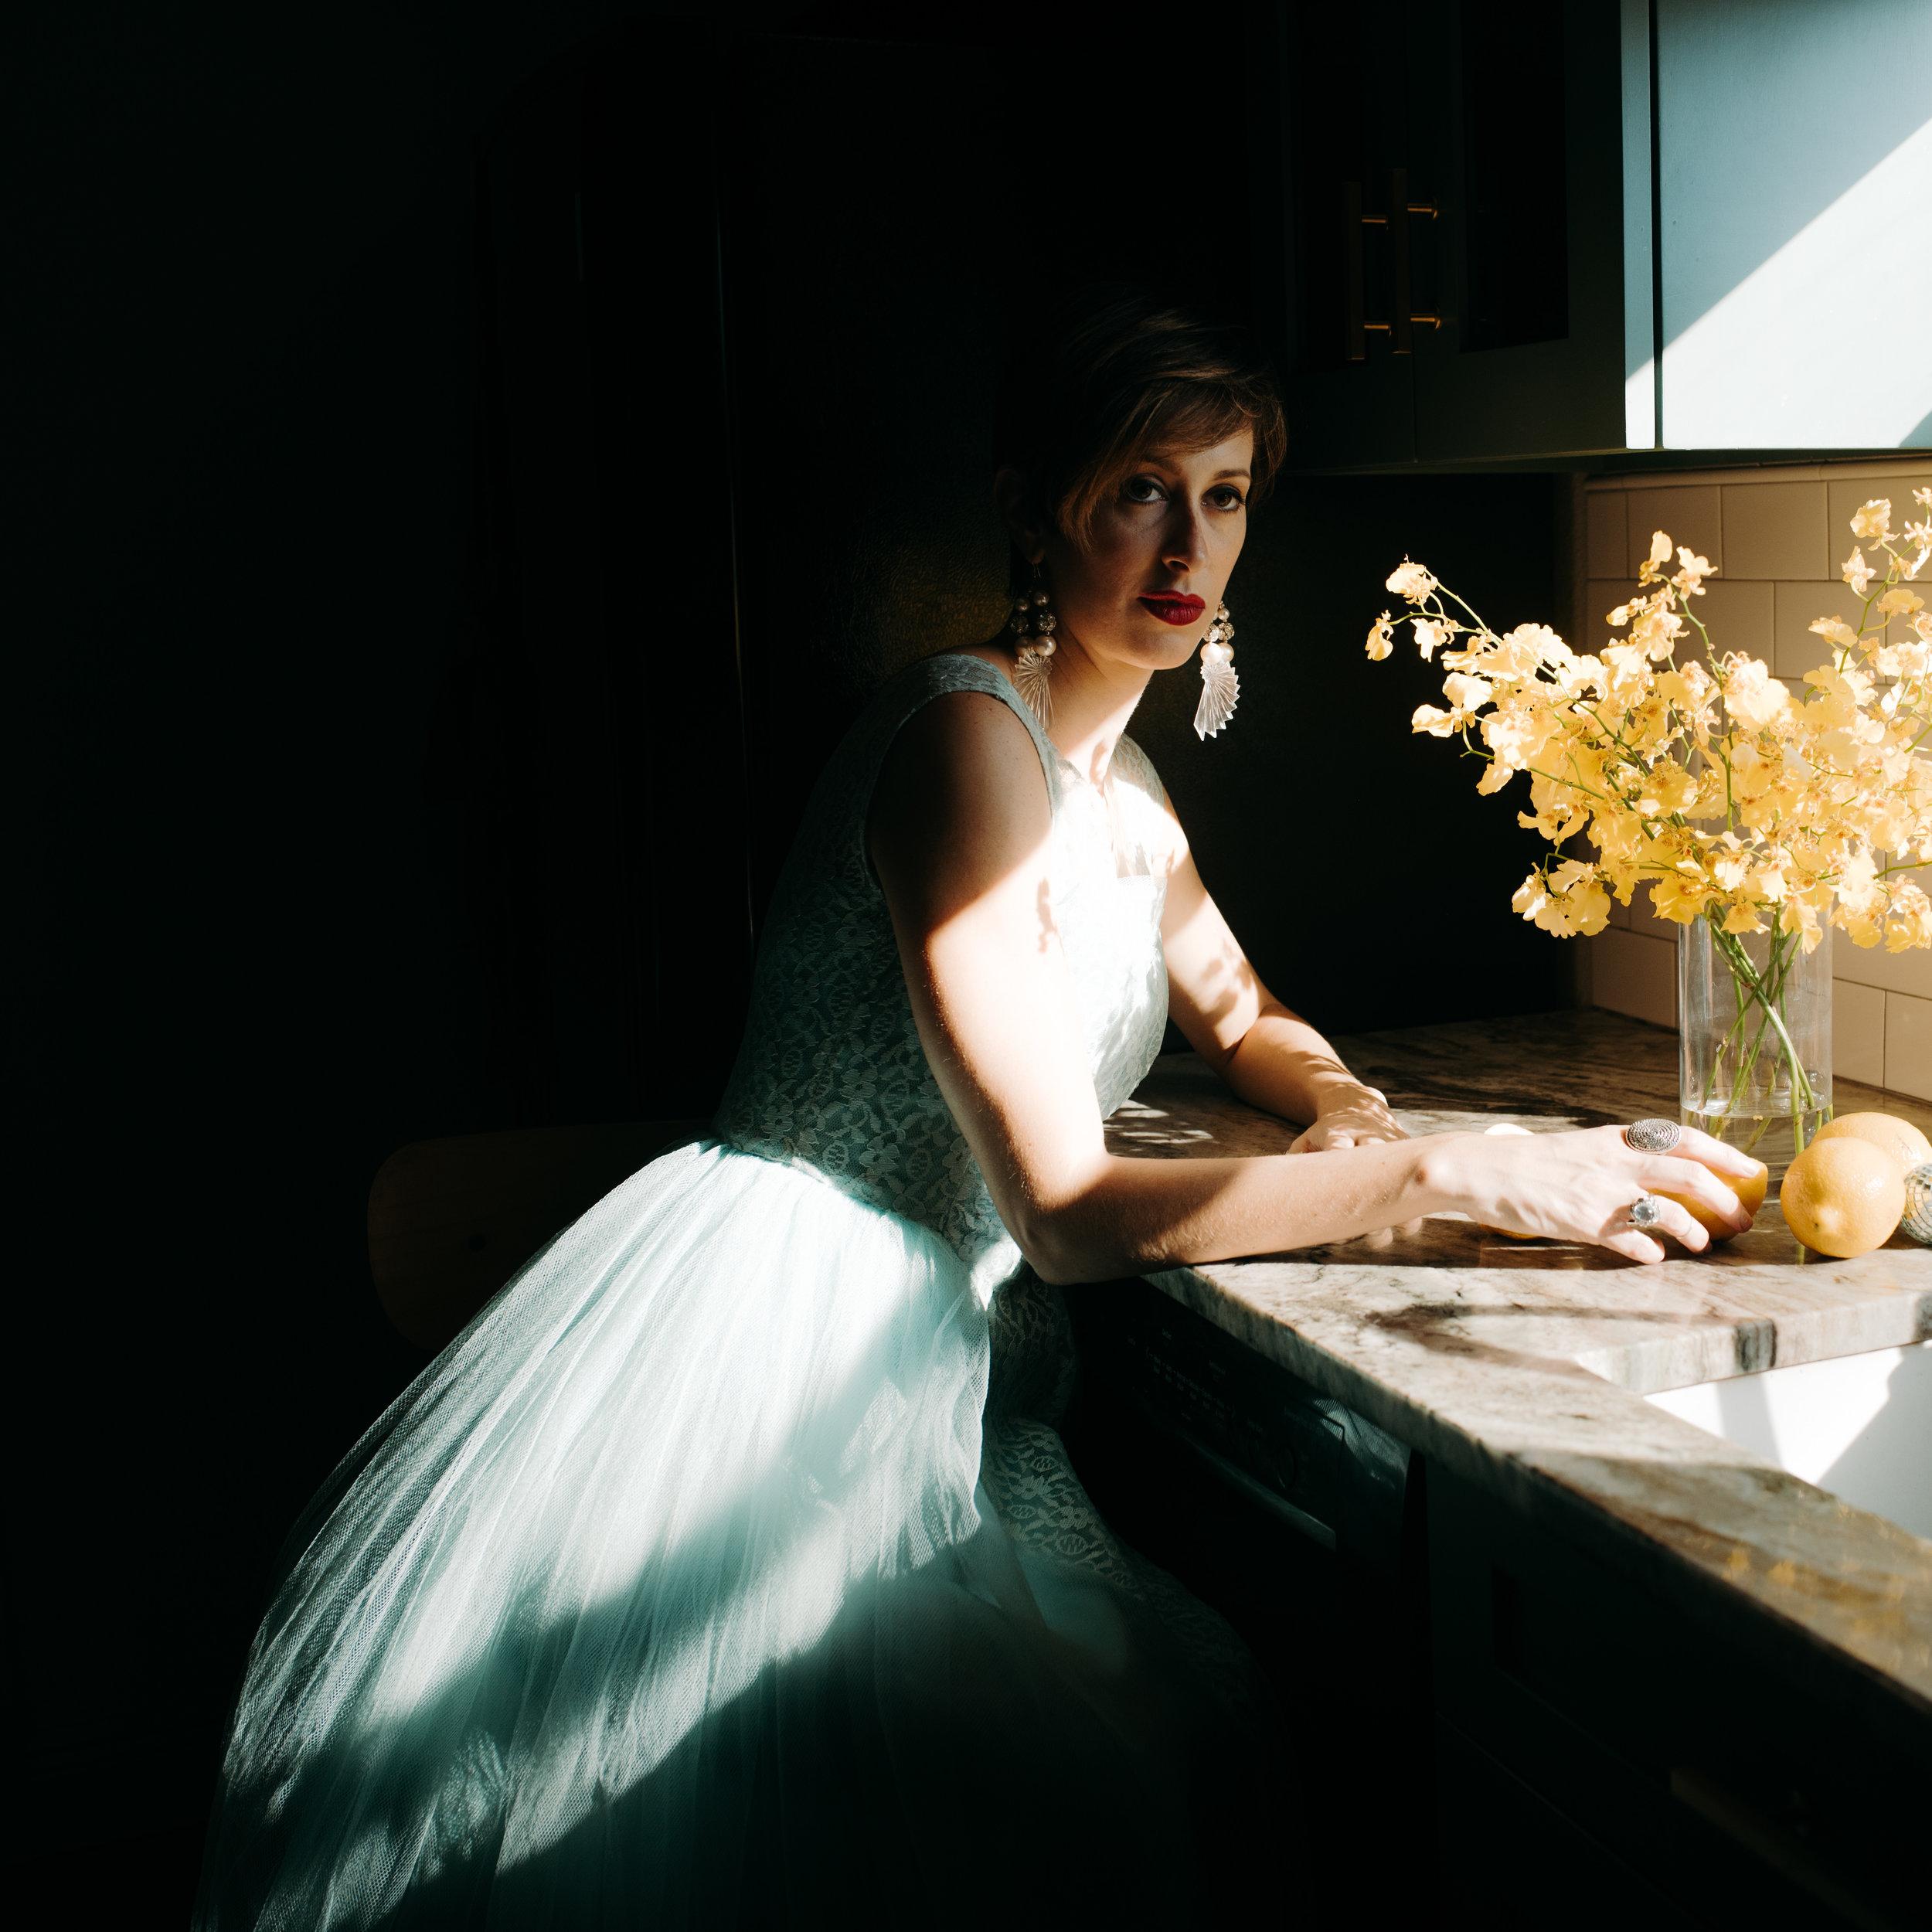 carissa-spencer-mid-century-editorial-in-home-couple-session-orlando-florida-167.jpg